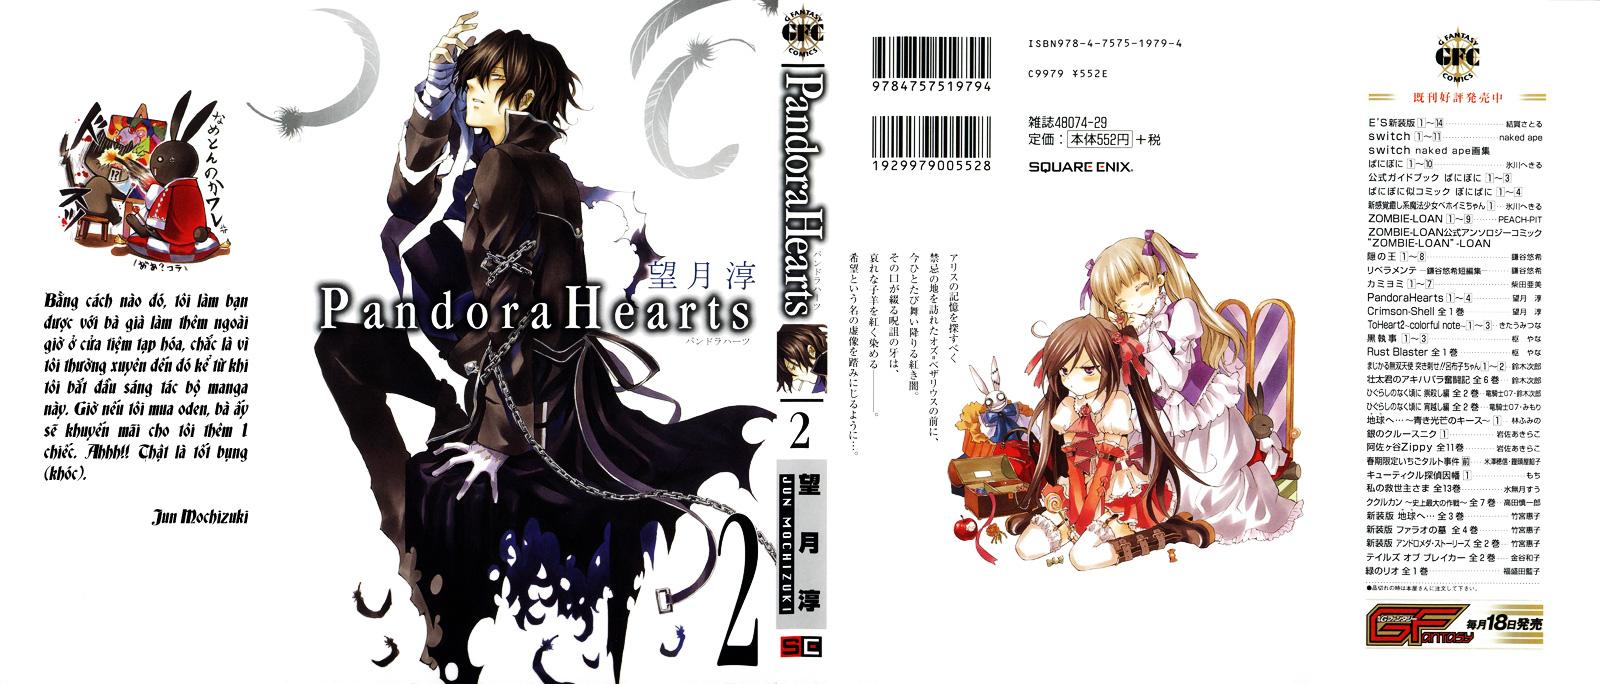 Pandora Hearts chương 005 - retrace: v clockwise doom trang 1